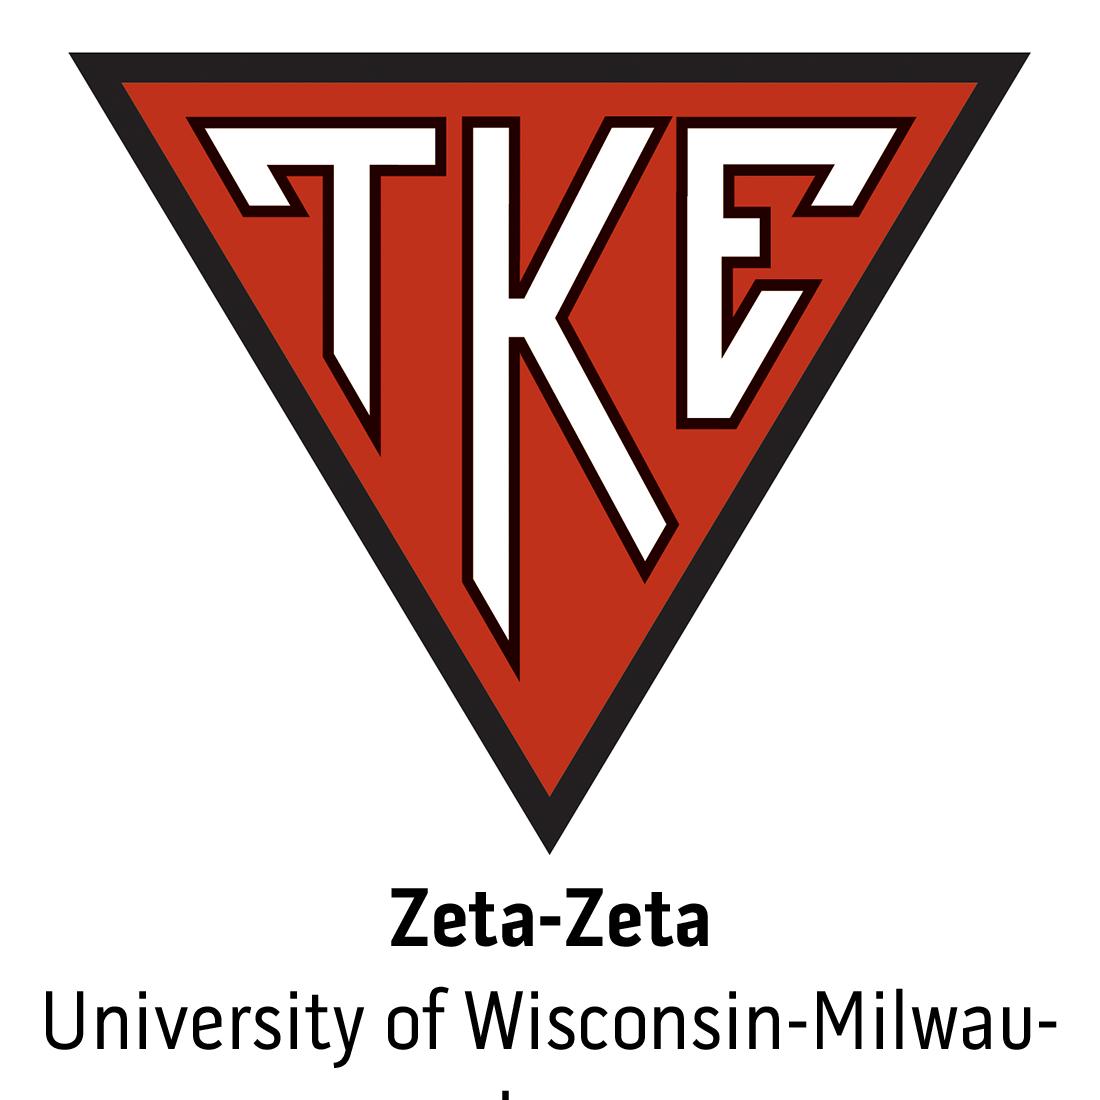 Zeta-Zeta C at University of Wisconsin-Milwaukee